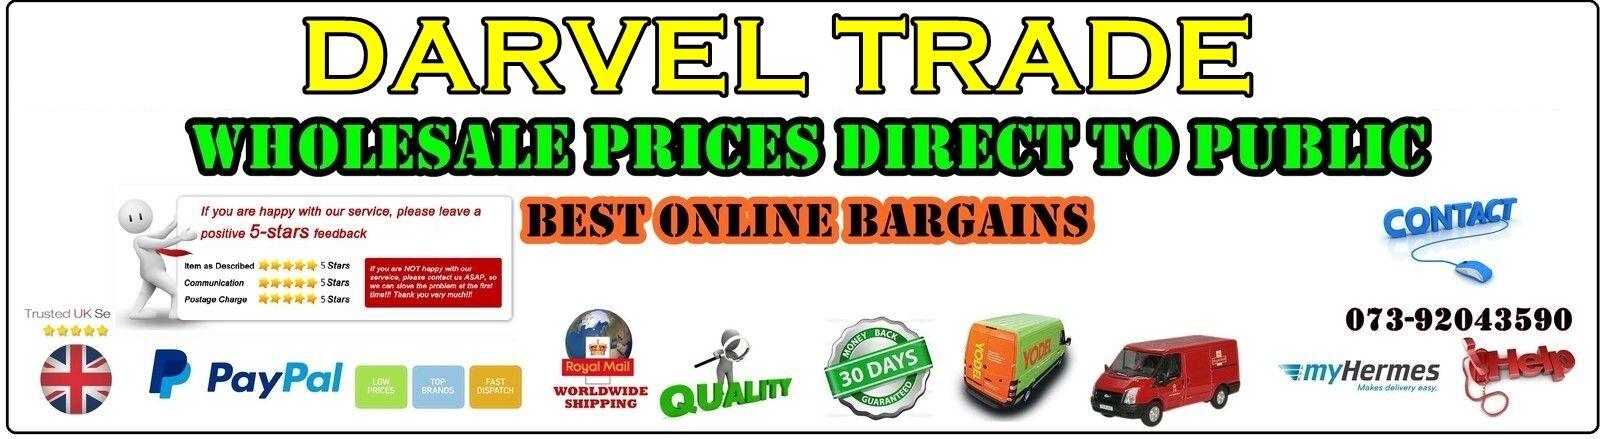 Darvel Trade